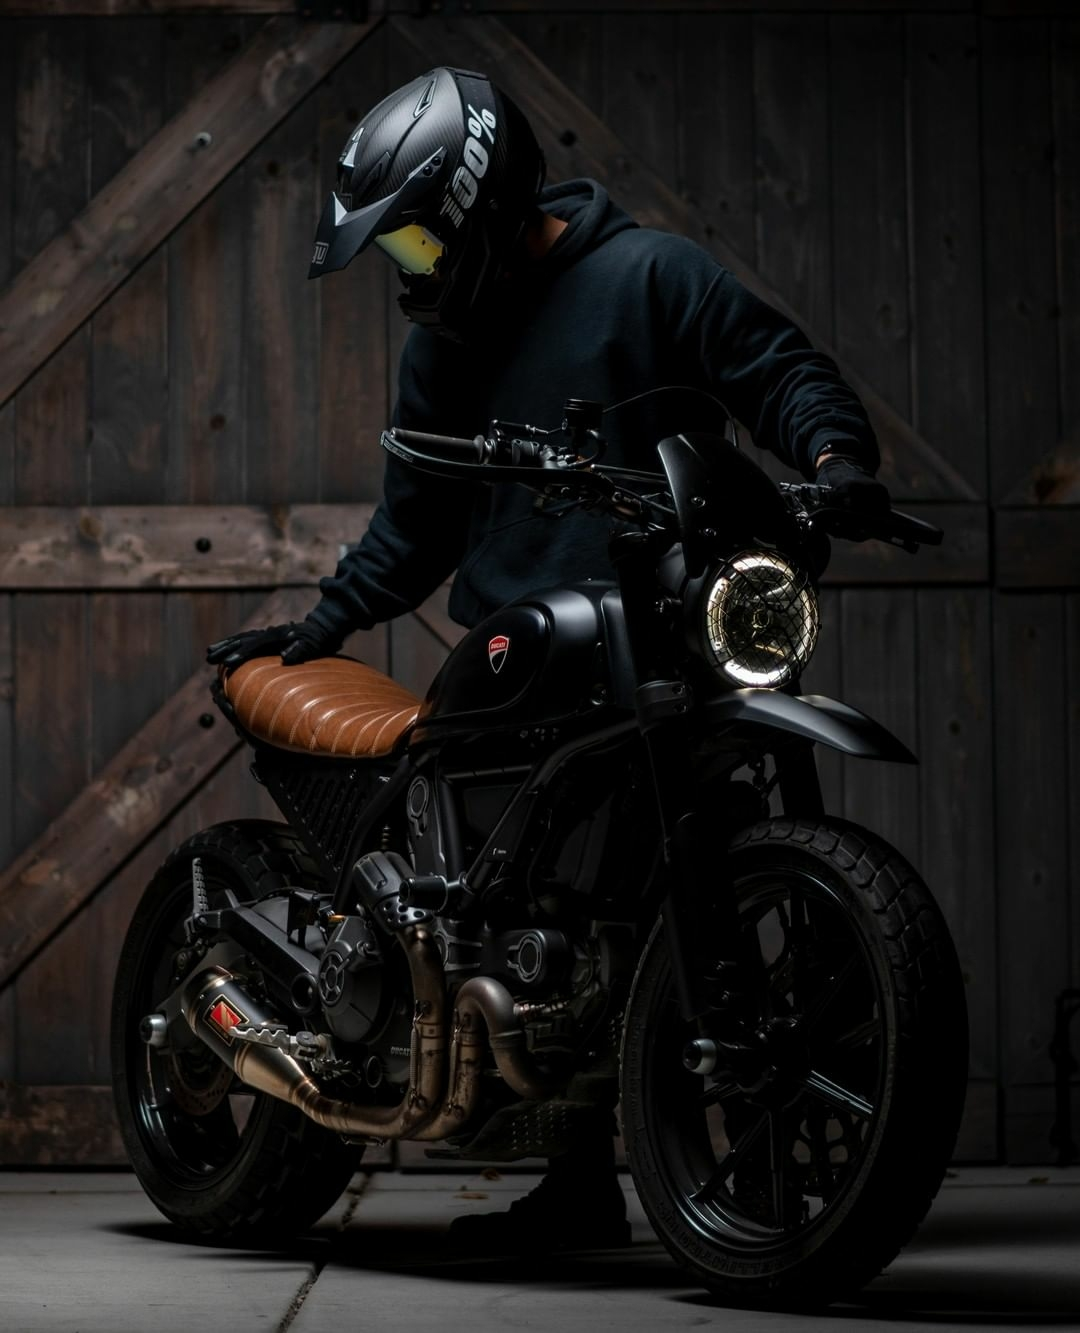 man standing next to motorcycle